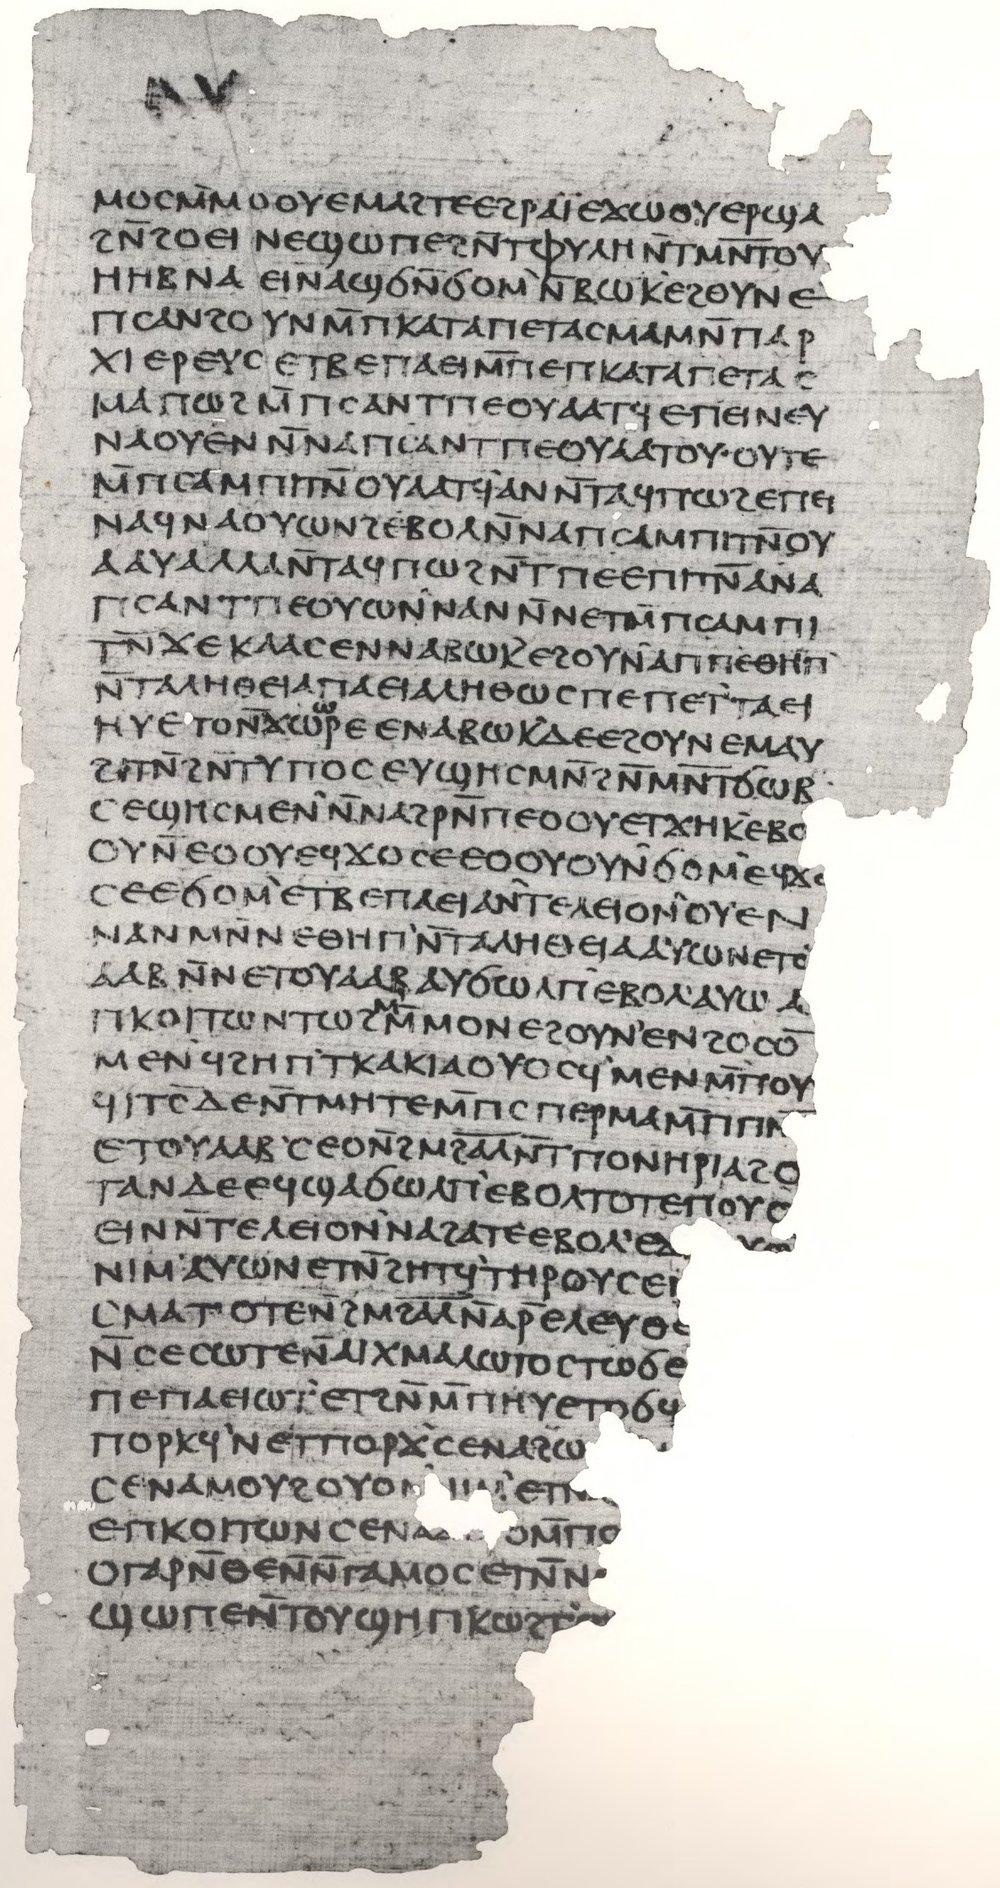 Gospel_of_Philip_facsimile_Page_85.jpg